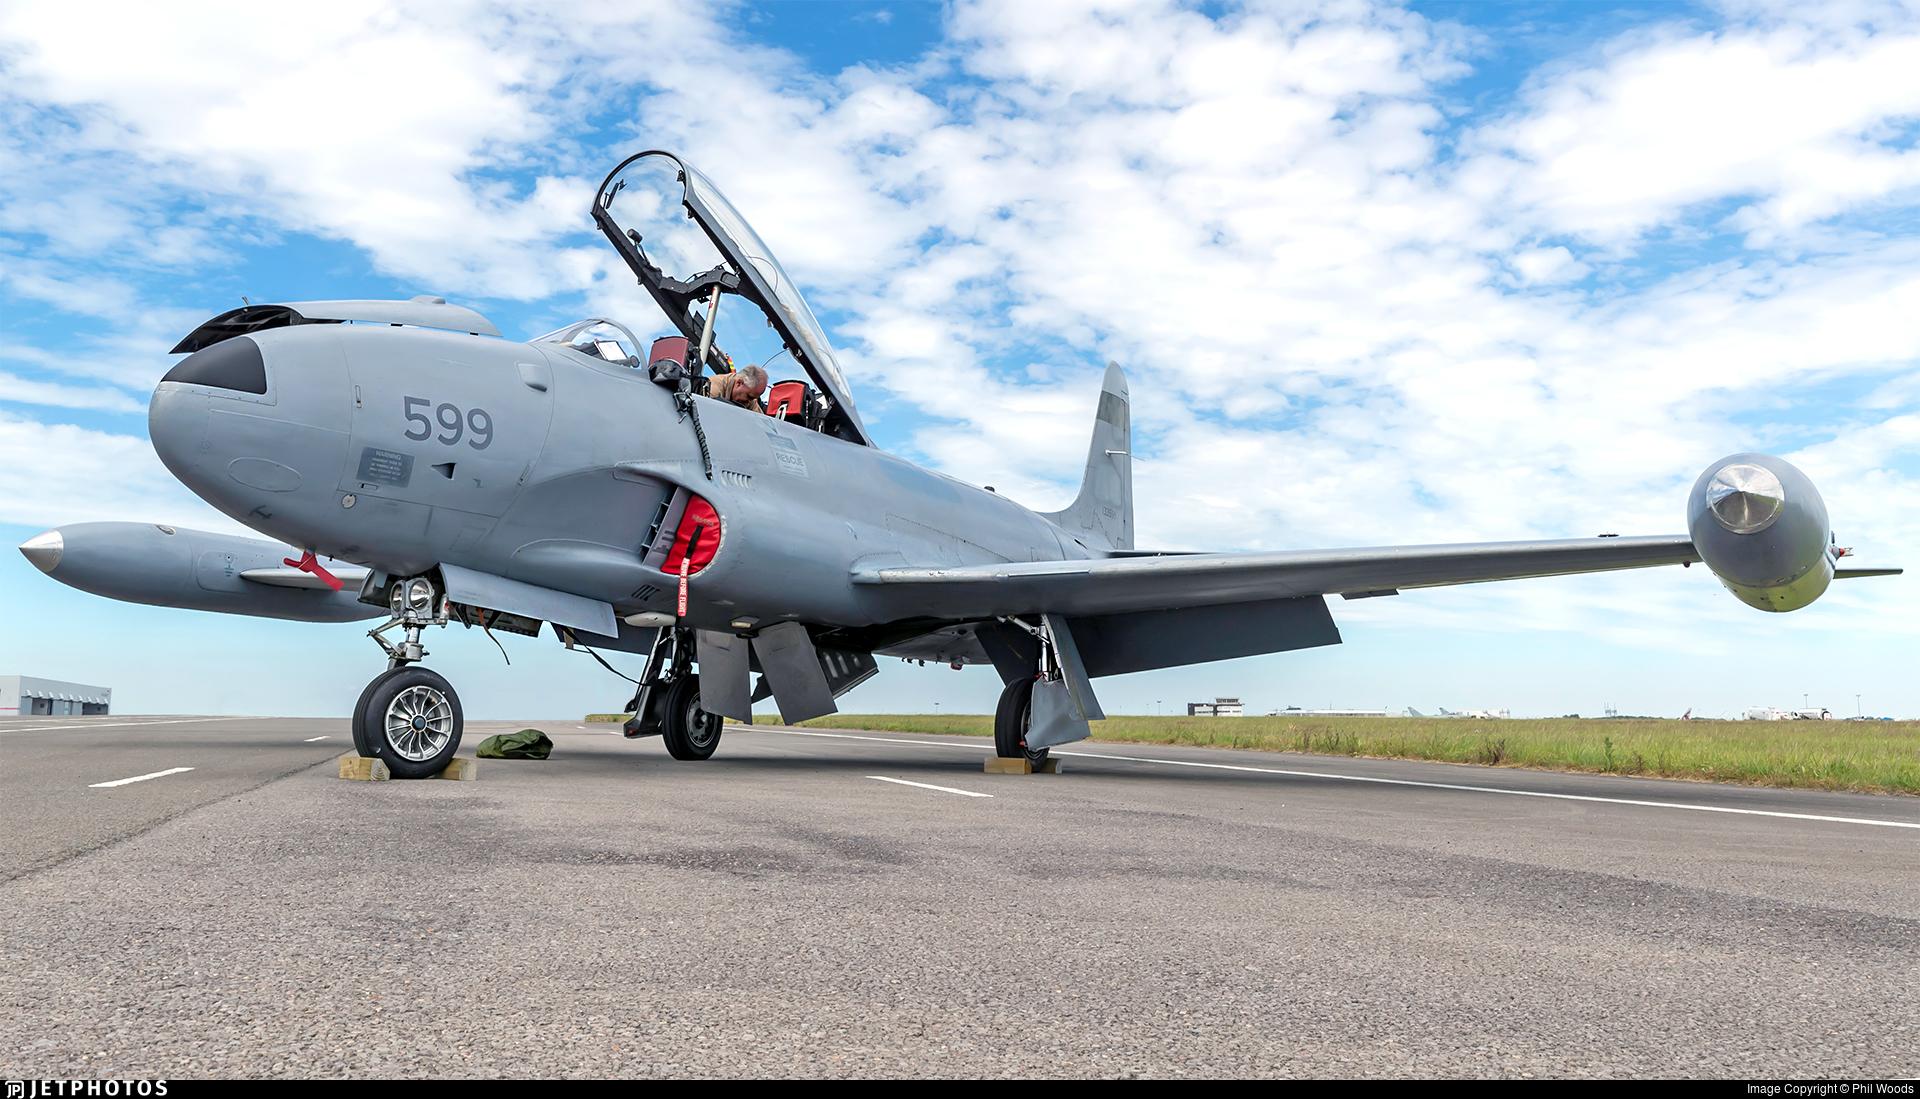 LN-DPS - Canadair CT-133 Silver Star - Private